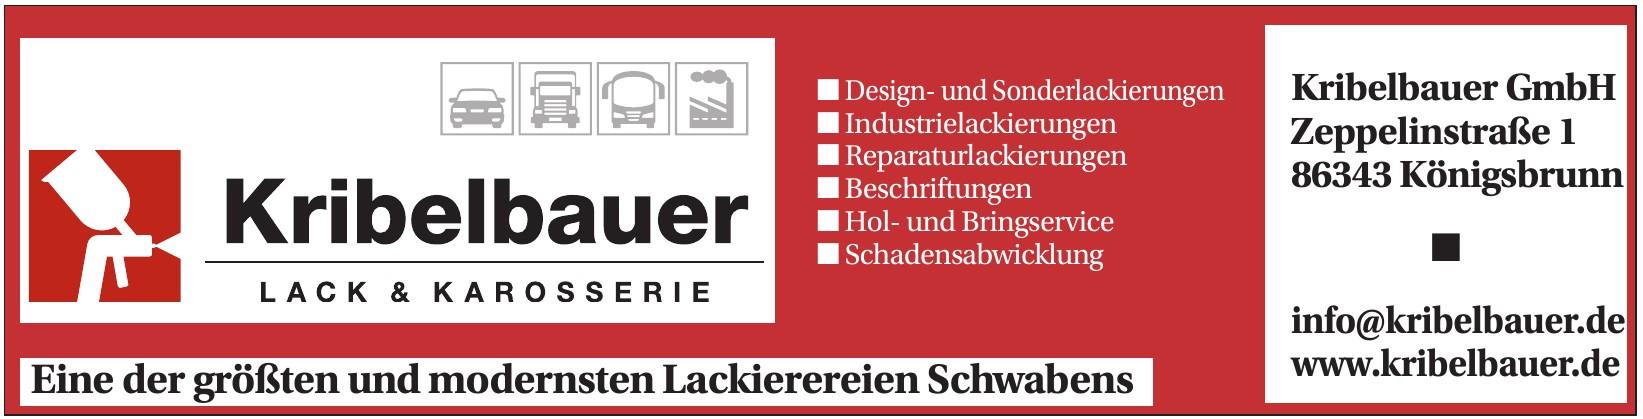 Kribelbauer GmbH